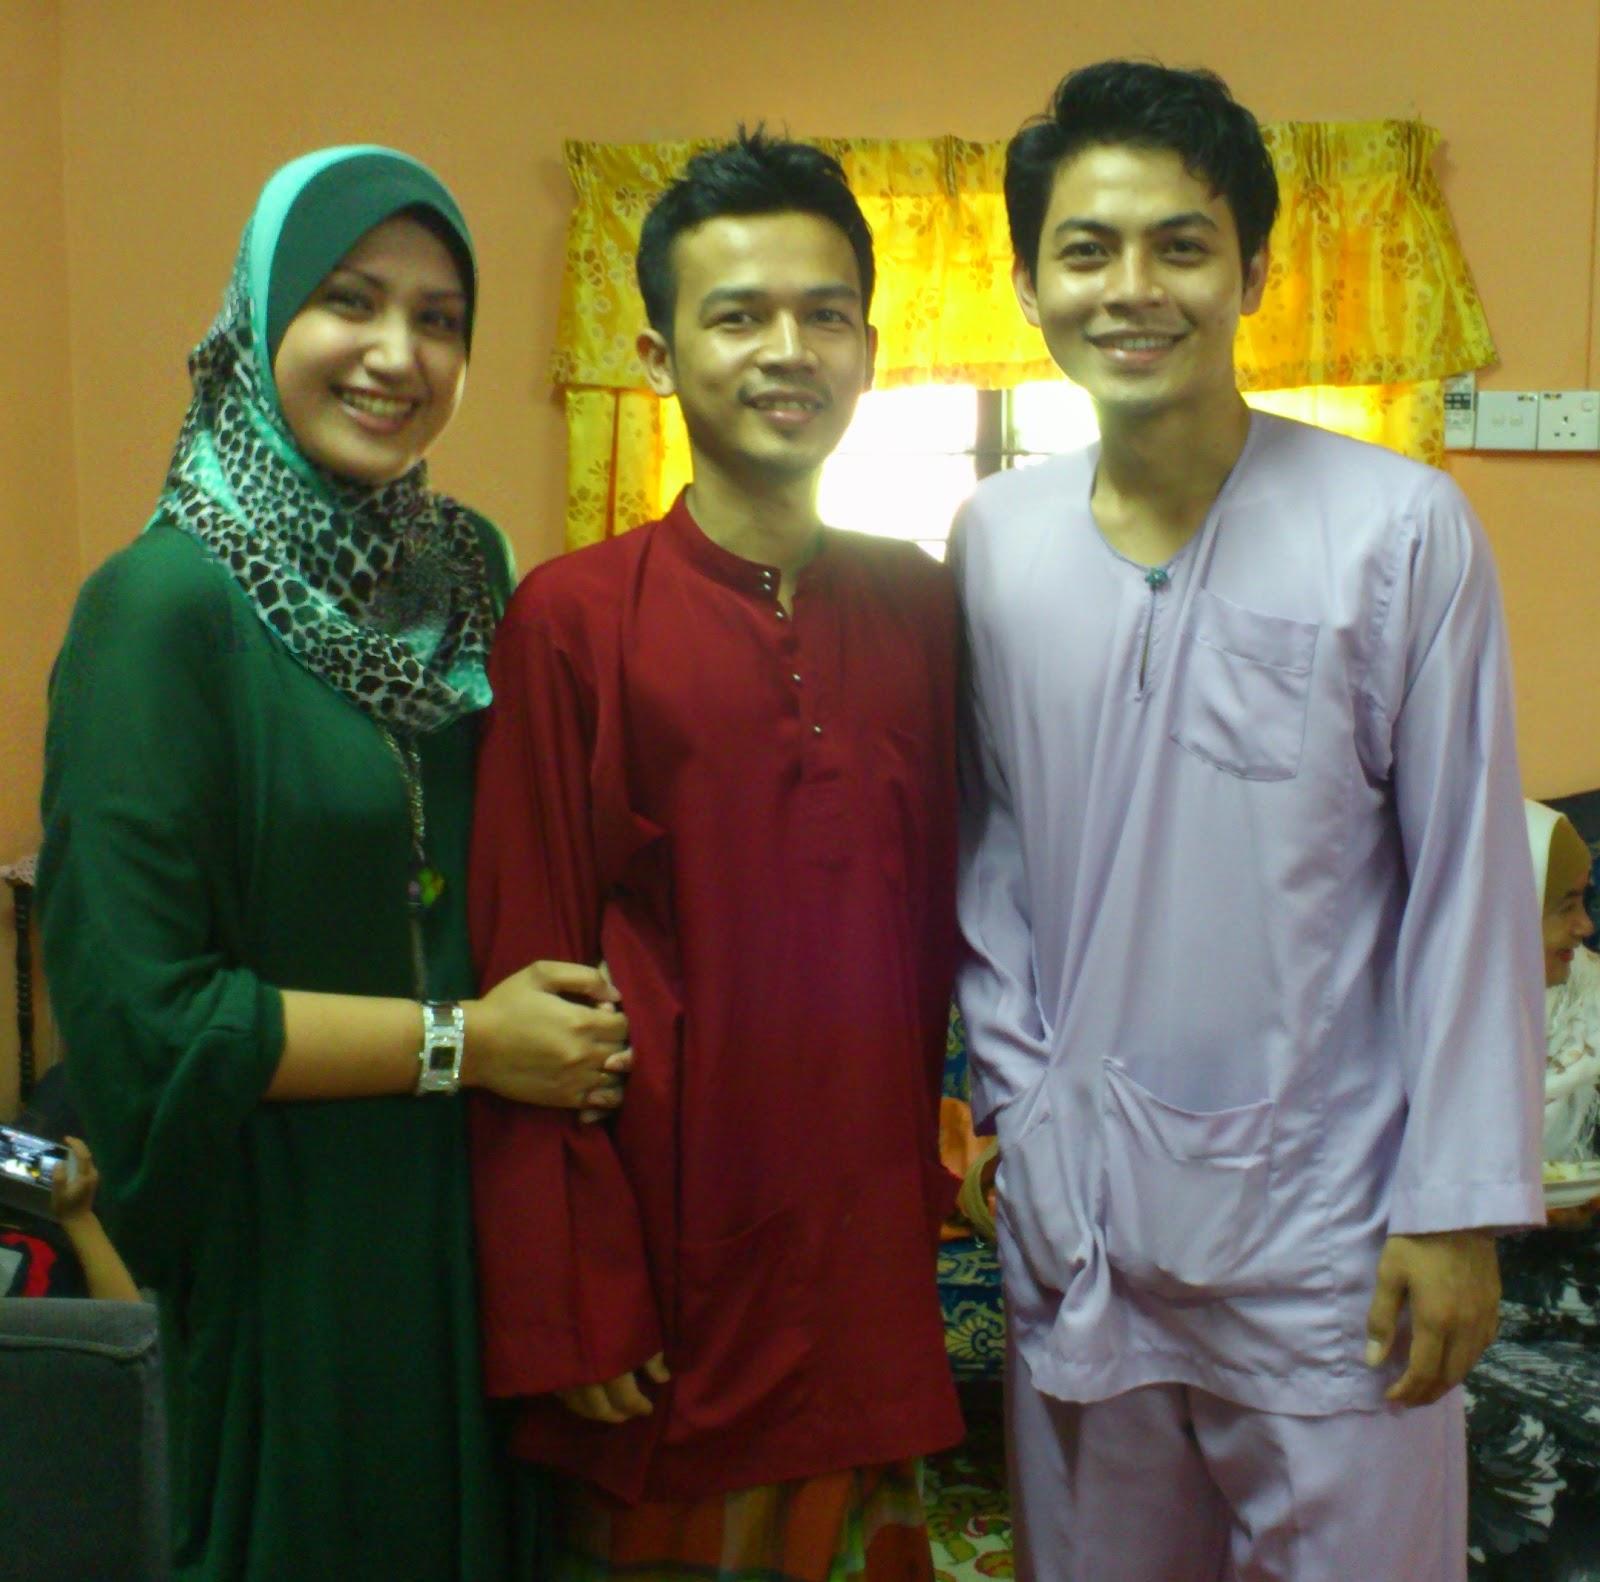 Hari Raya with Izzue Islam